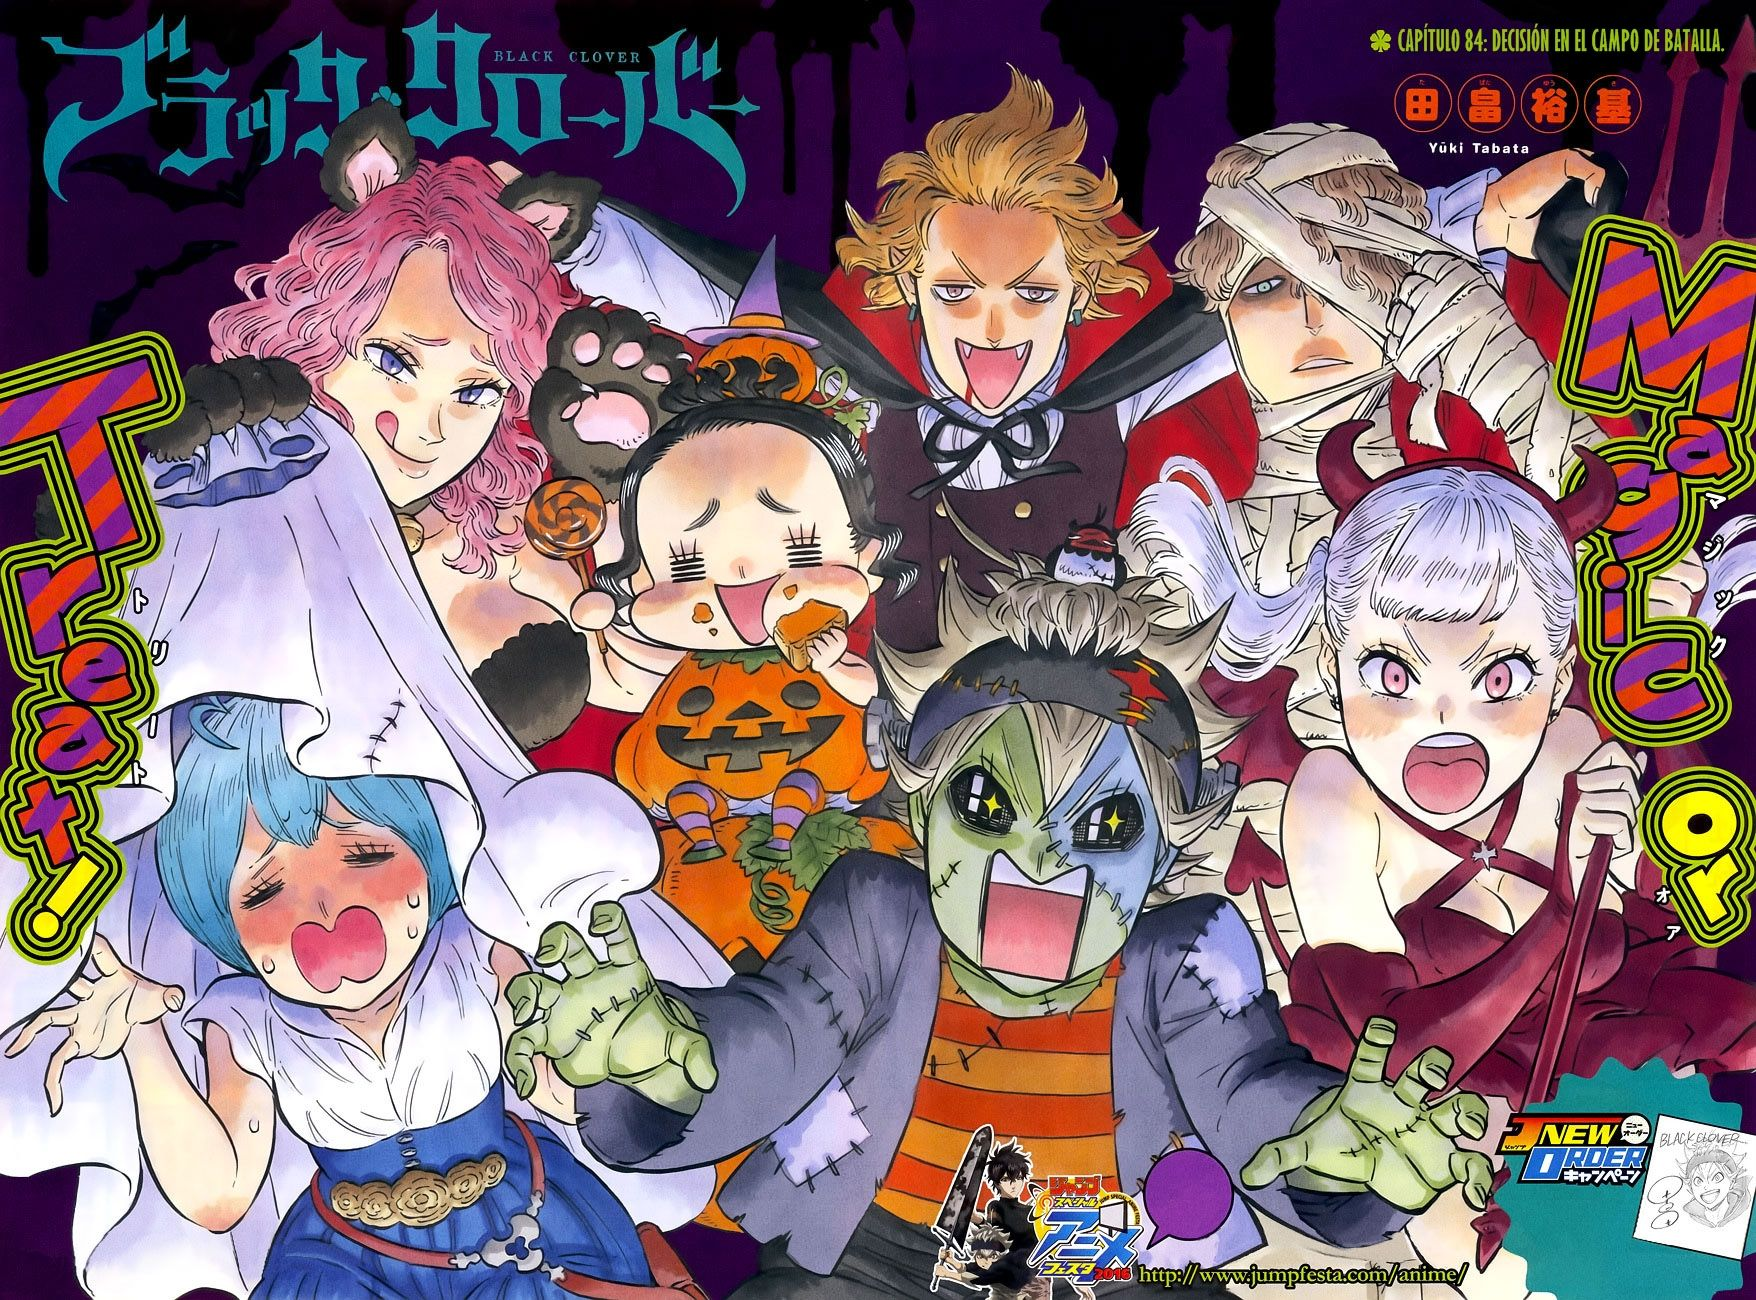 http://c5.ninemanga.com/es_manga/pic2/35/3811/514192/f10424d2b1cbf840765291e98f4ea293.jpg Page 3